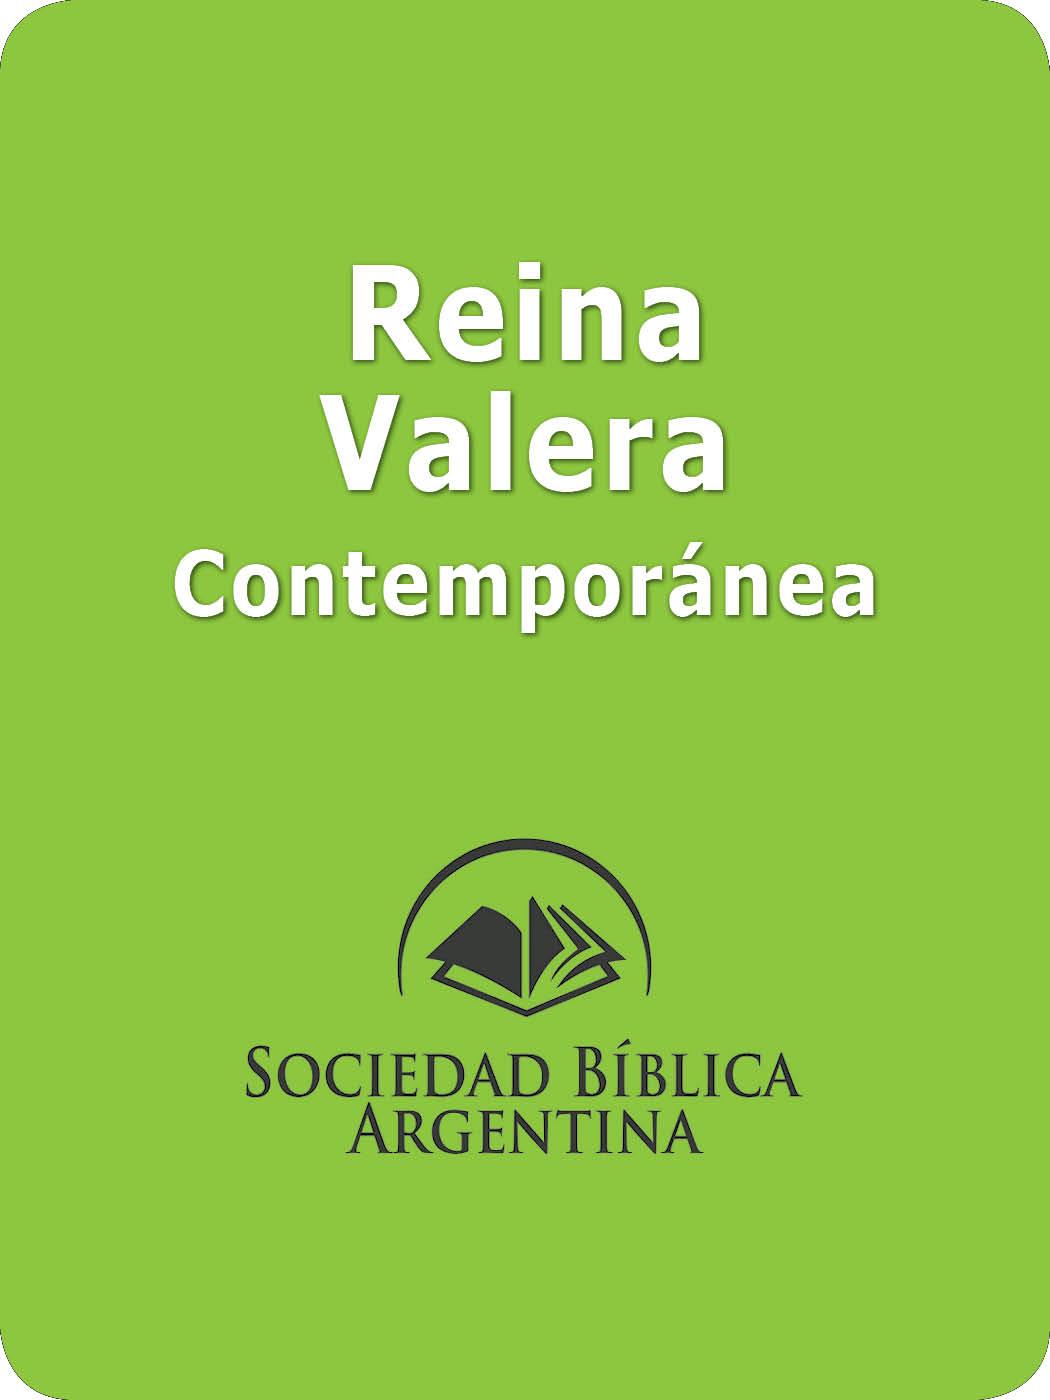 Reina Valera Contemporánea